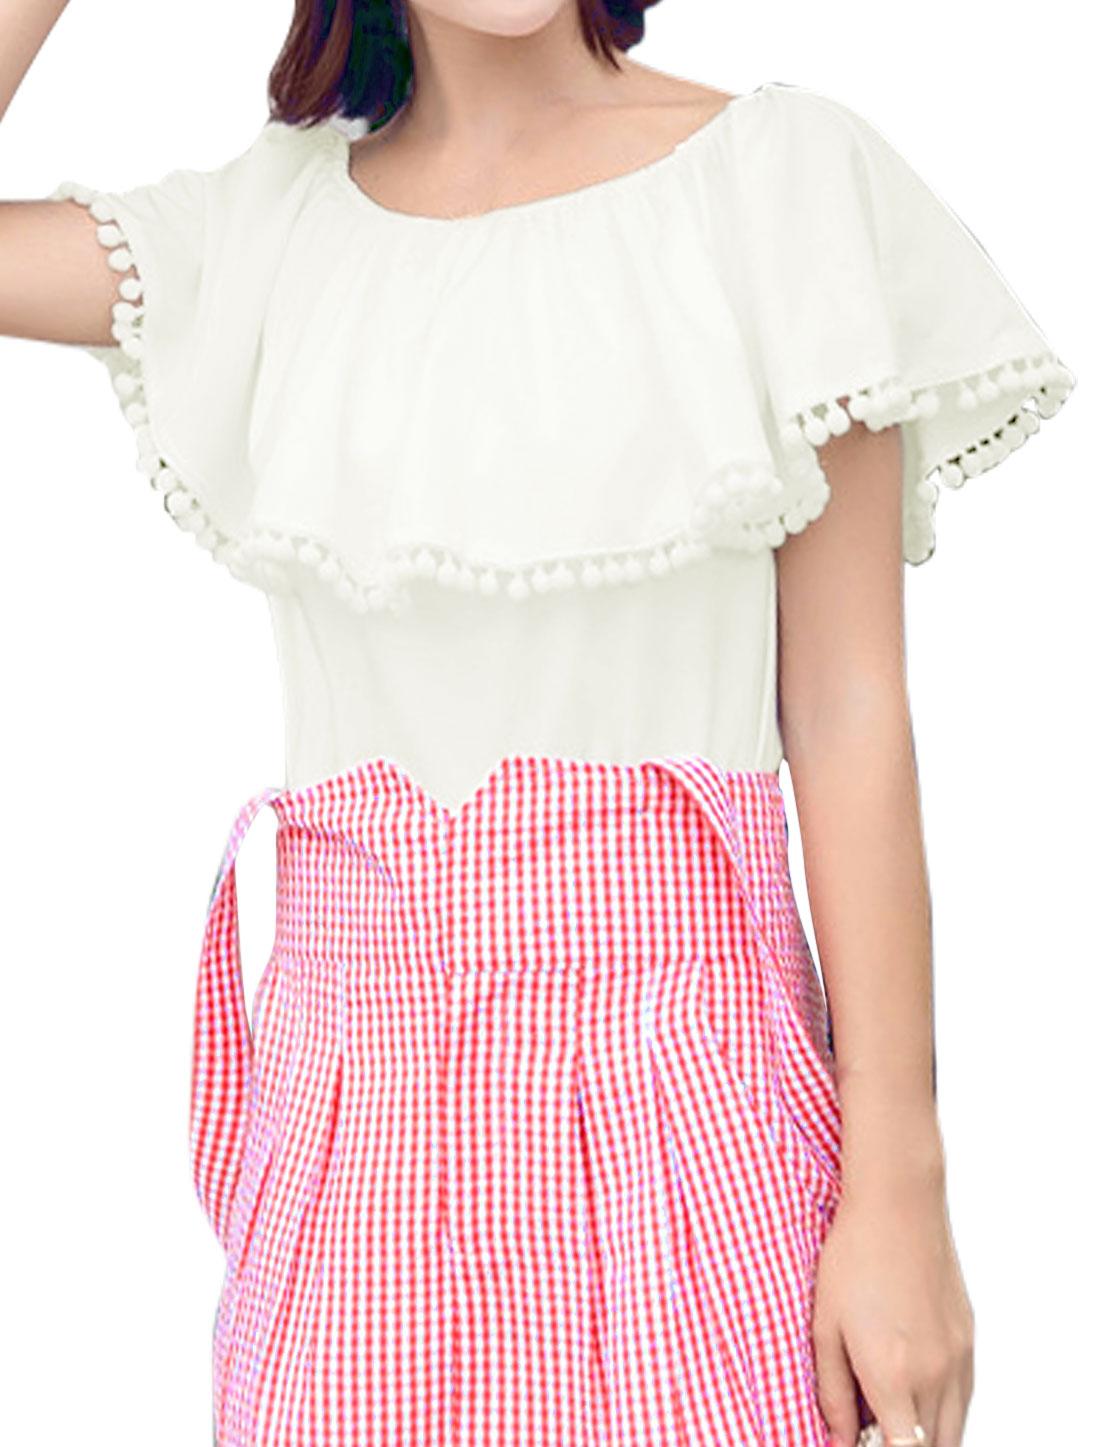 Women Flouncing Pom-Pom Elastic Upper Multi-Way Wearing Blouse White XS